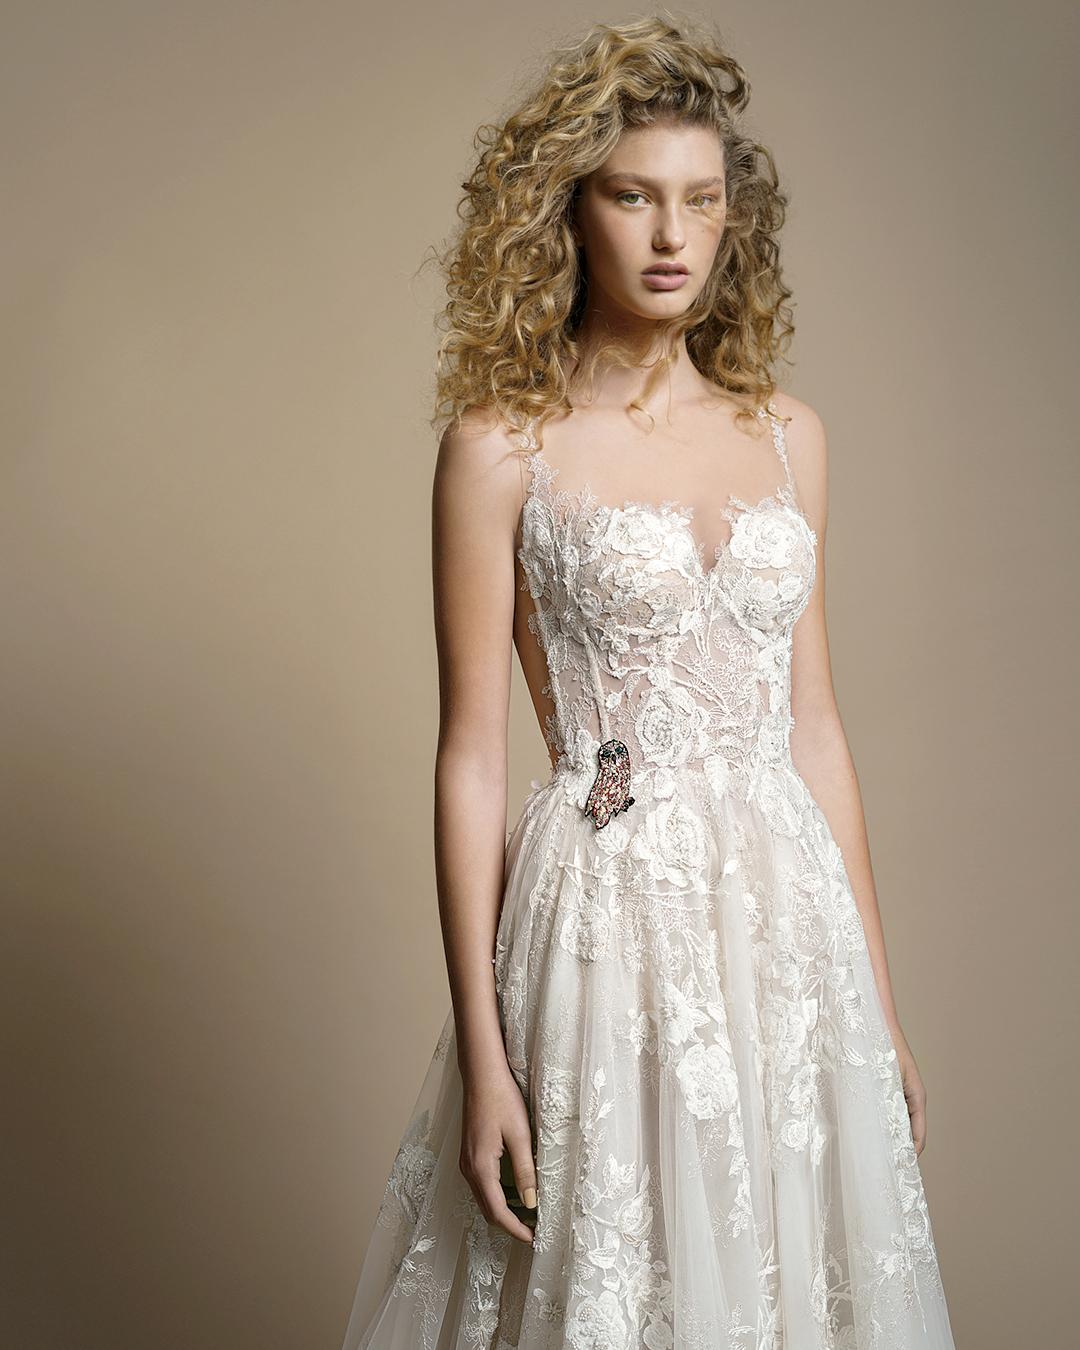 galia lahav gala wedding dress spring 2019 lace sweetheart a-line